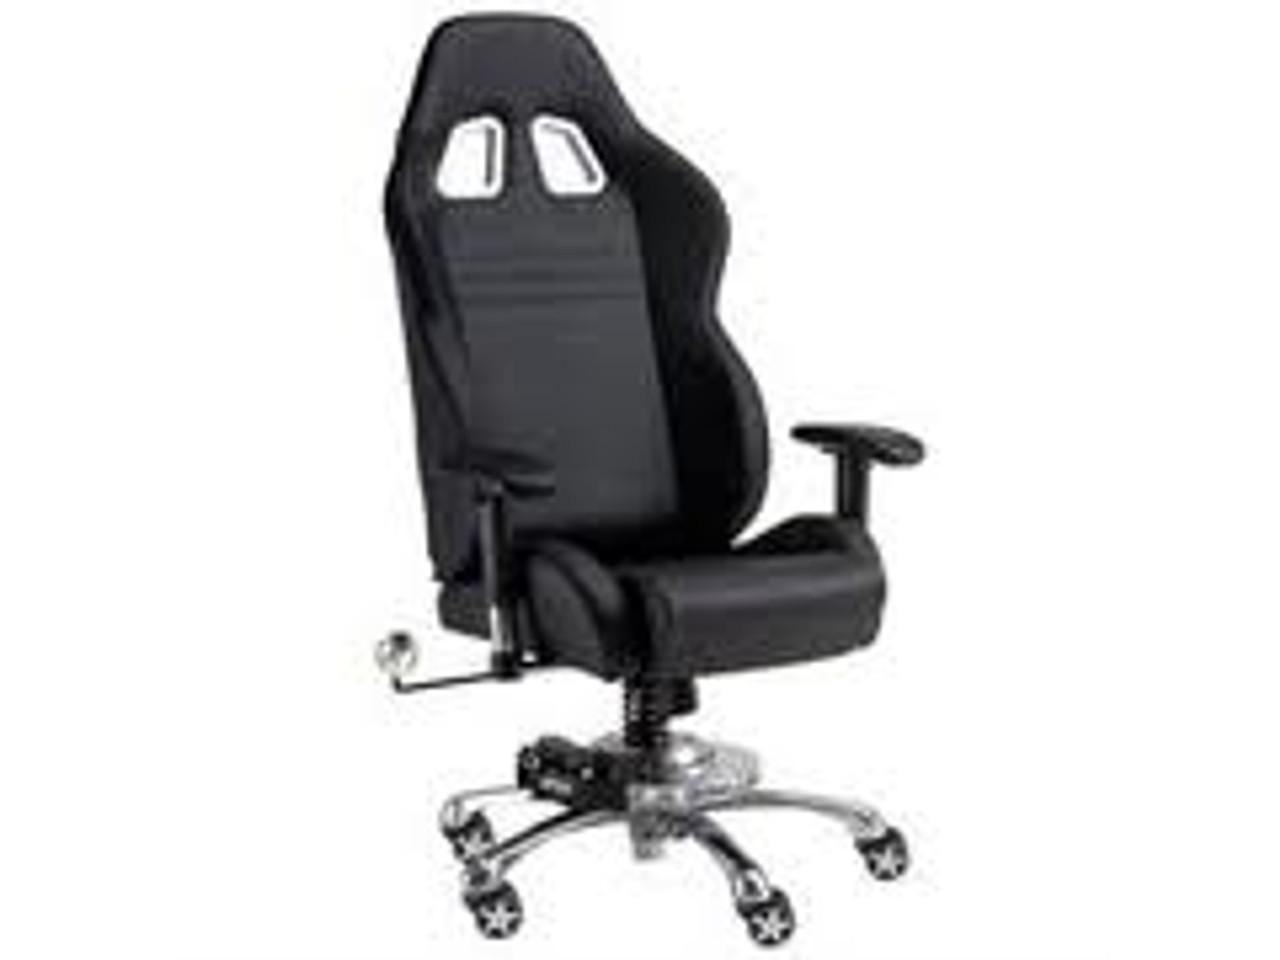 Intro-Tech Automotive PitStop Grand Prix Series Chair (GP1000B)